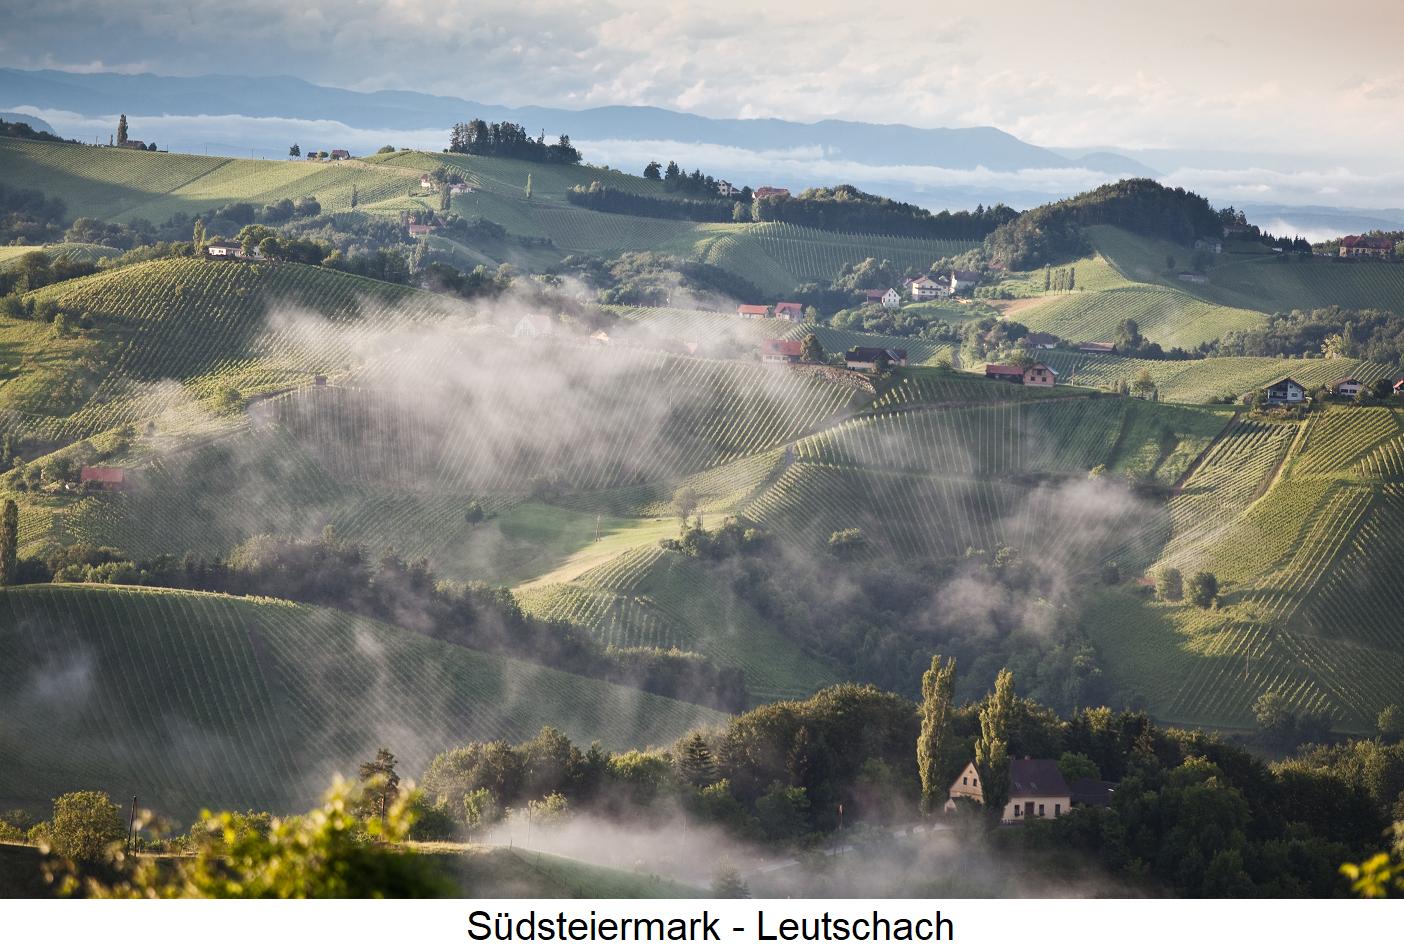 Südsteiermark - Leutschach